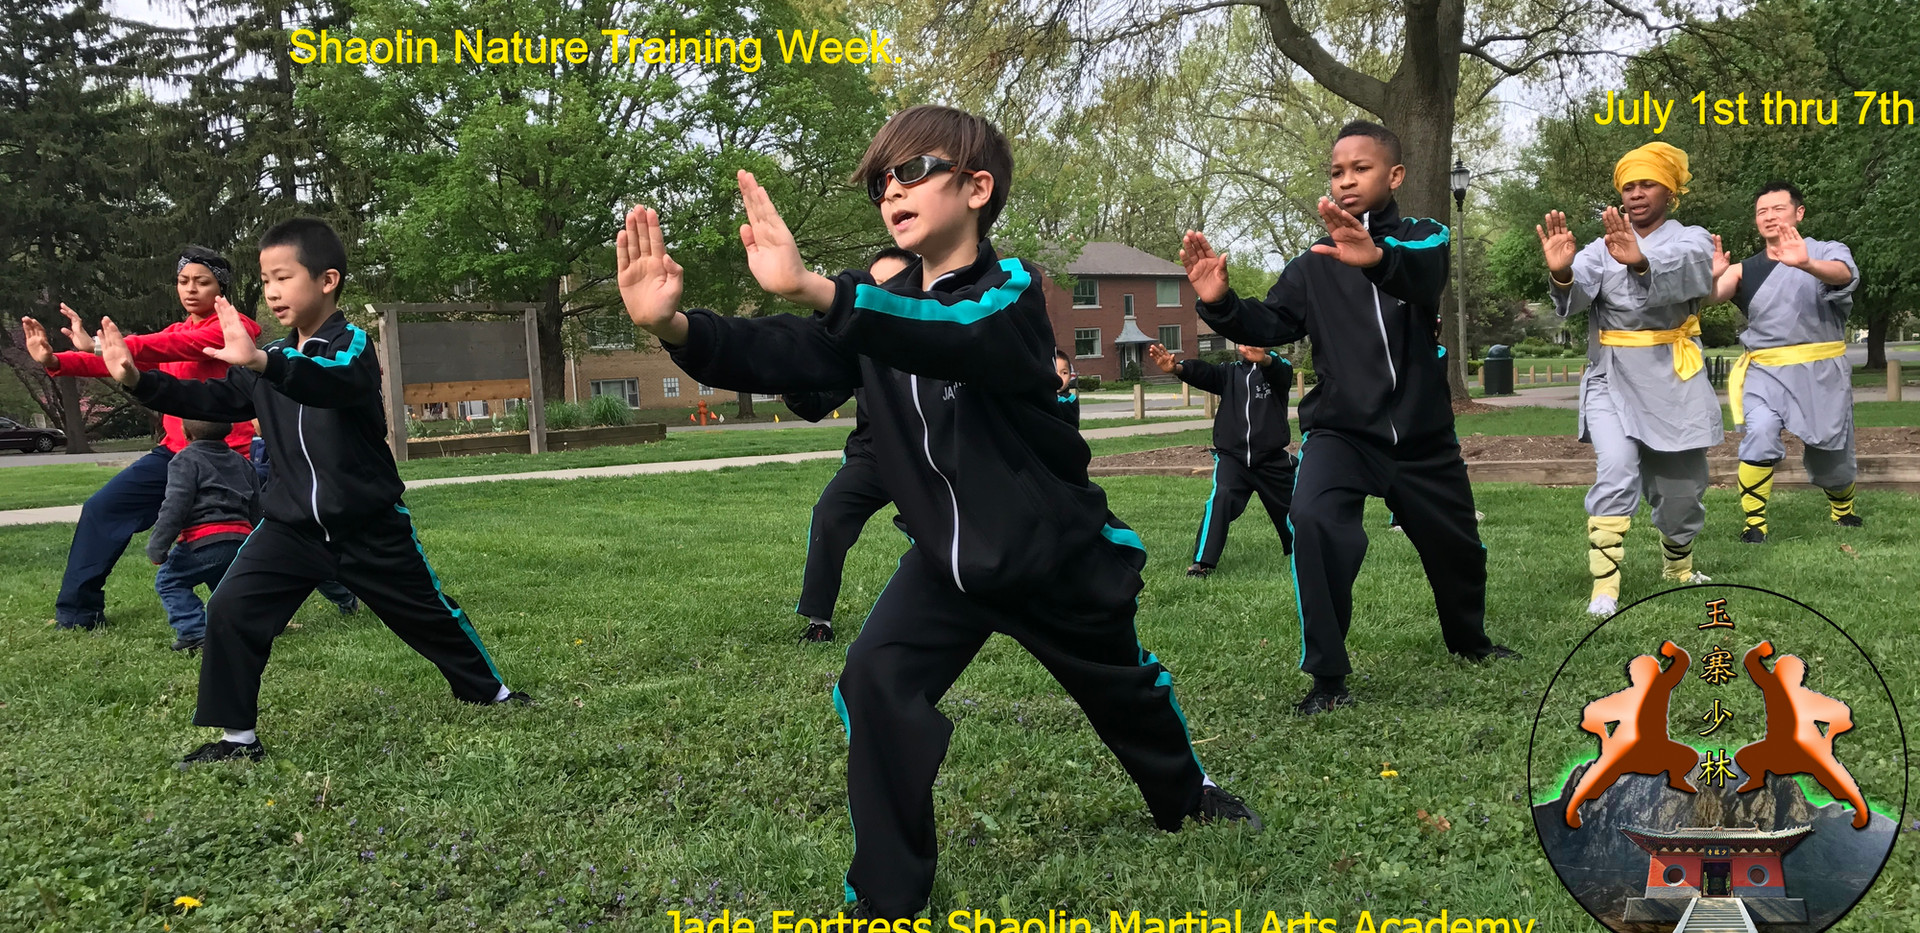 Shaolin Nature Training 2.jpg